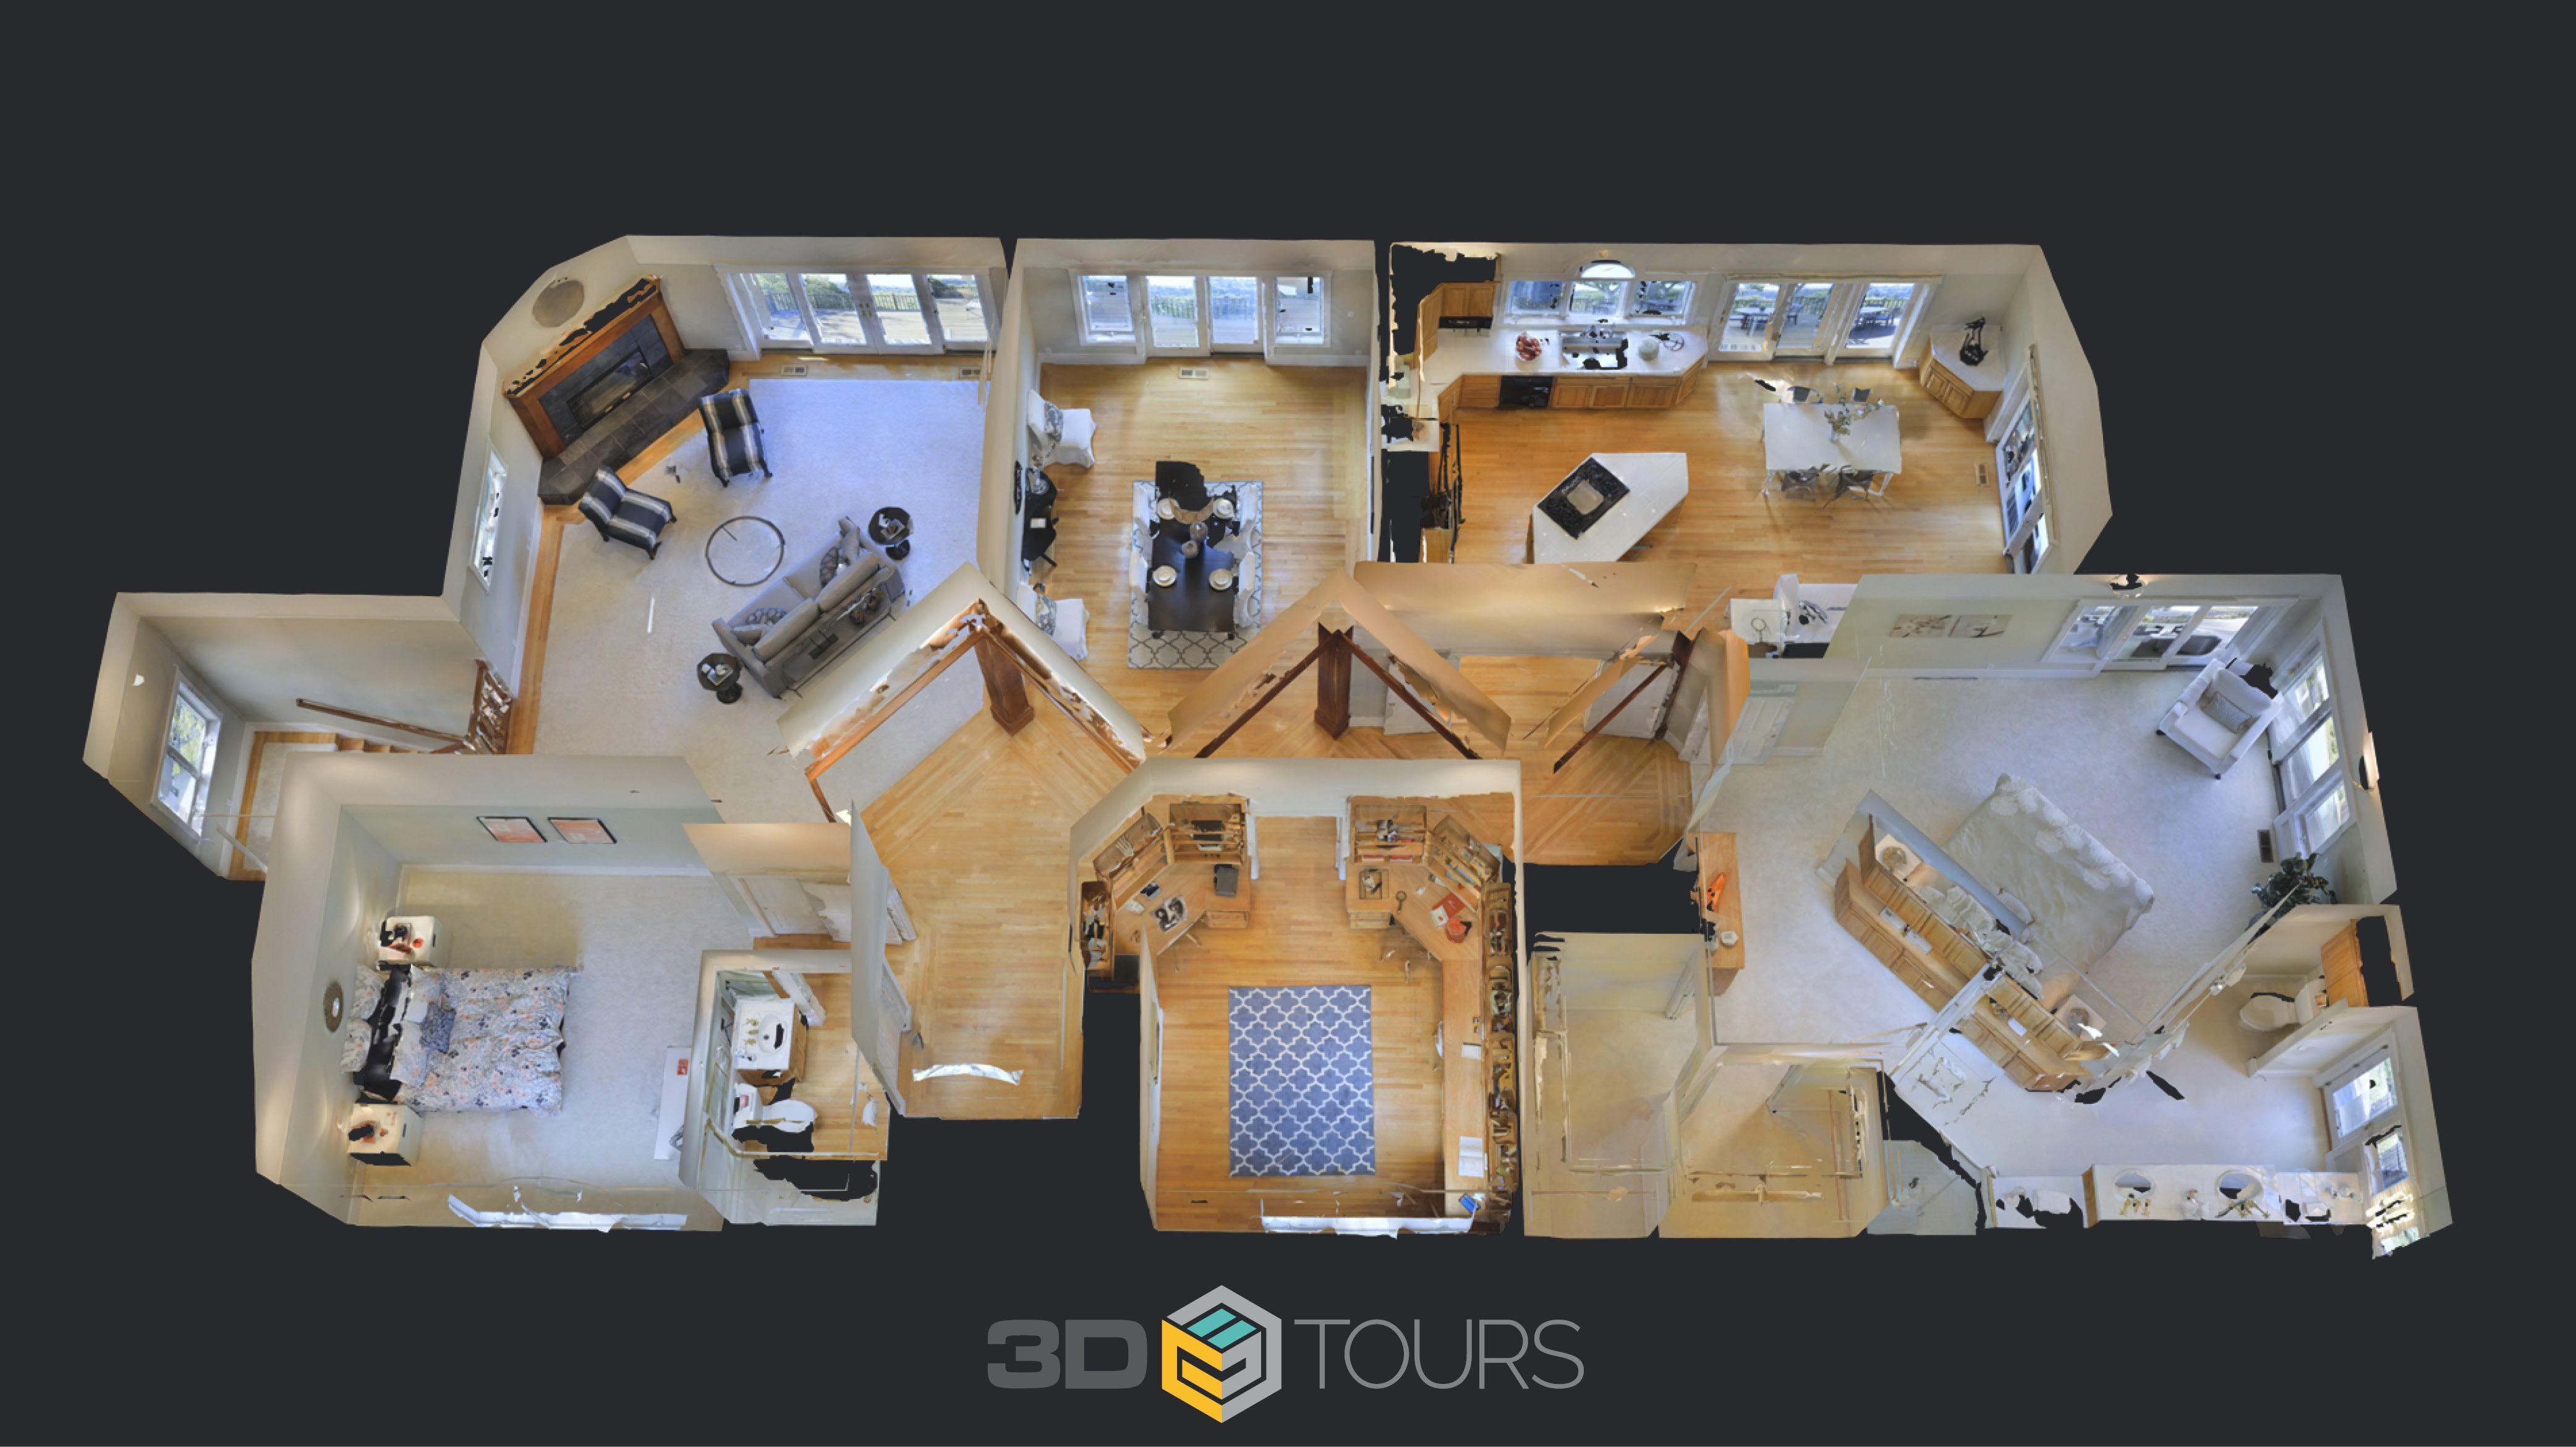 A dollhouse view created by a 3D tour